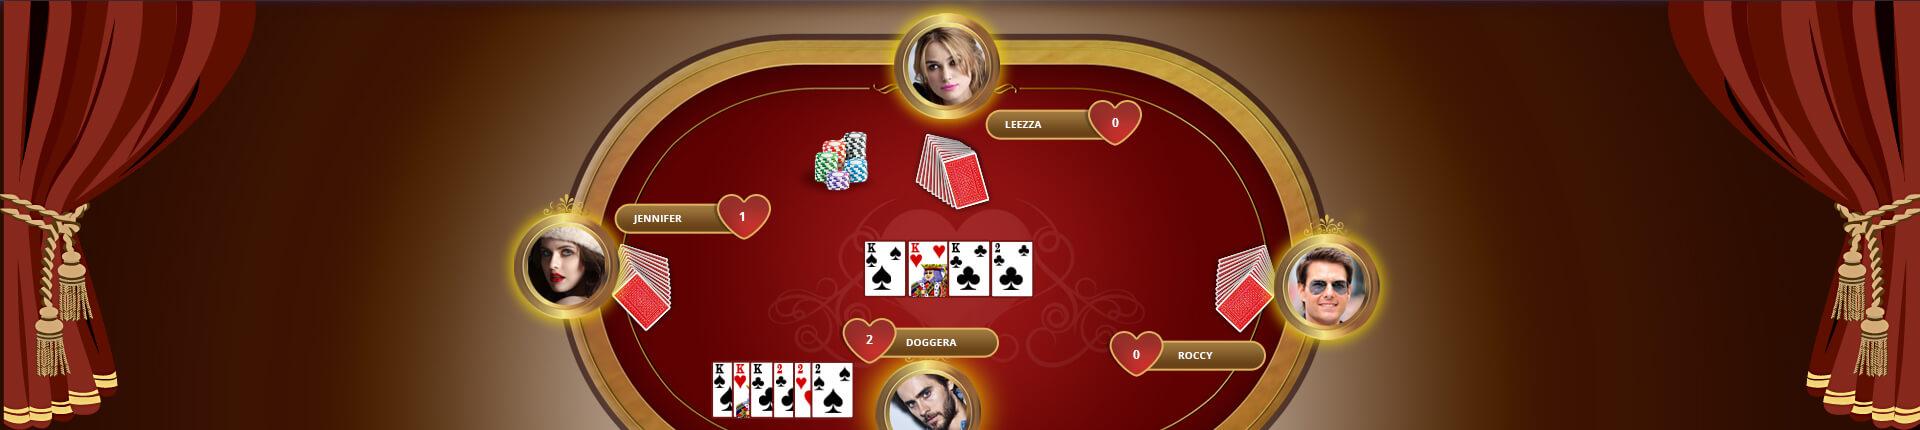 Hearts Card Game Development Company USA, Hire Hearts